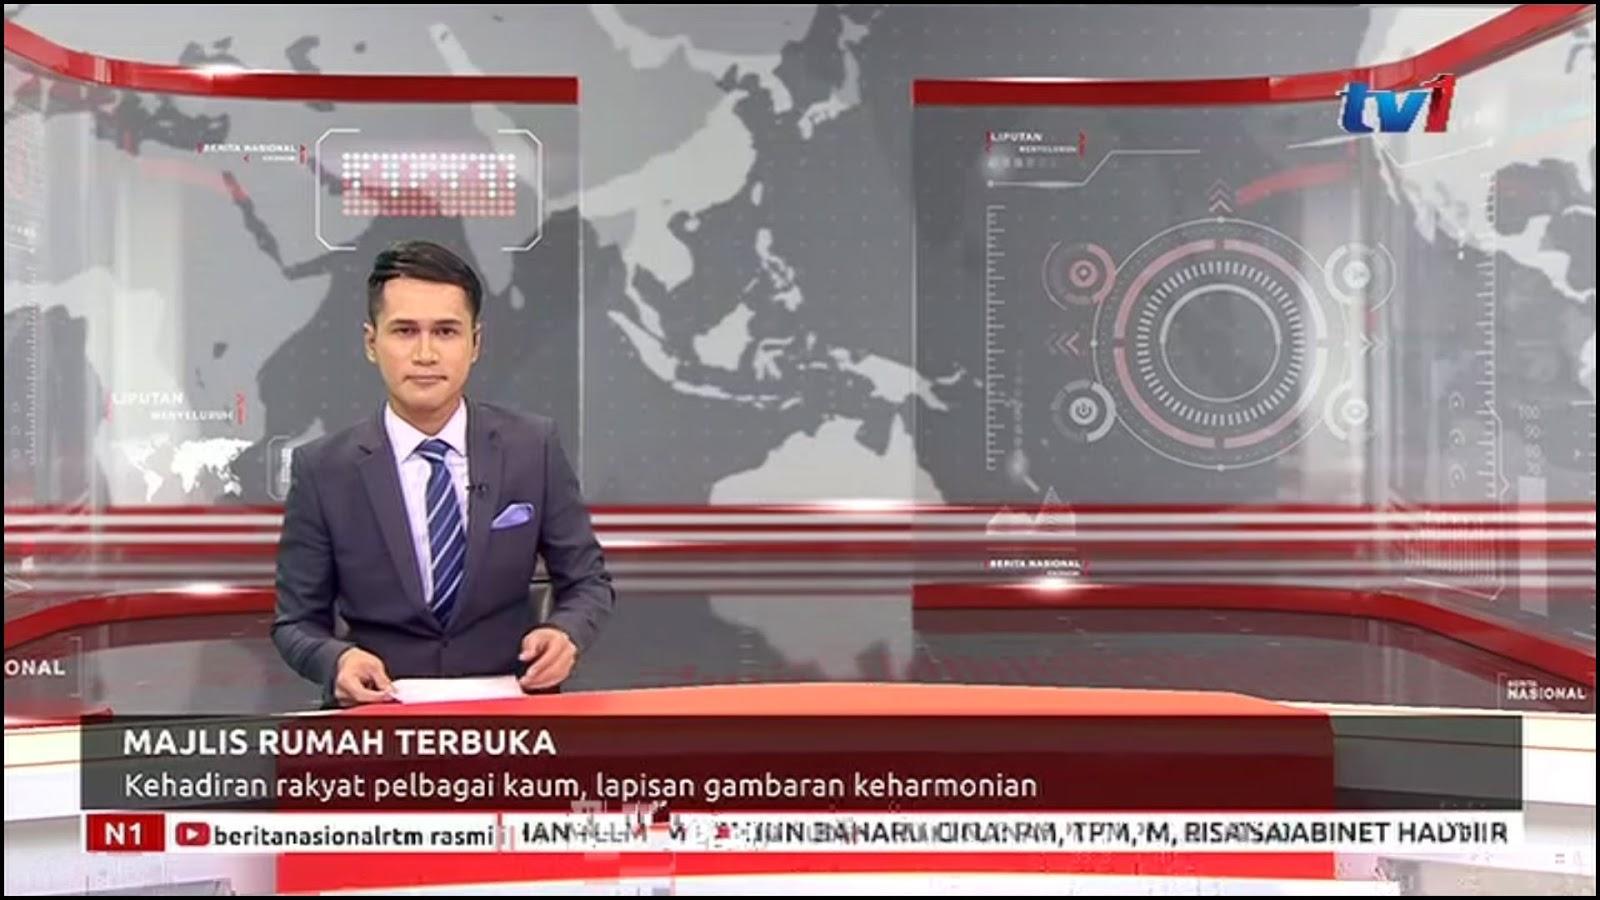 Frekuensi siaran RTM Malaysia di satelit Palapa D Terbaru